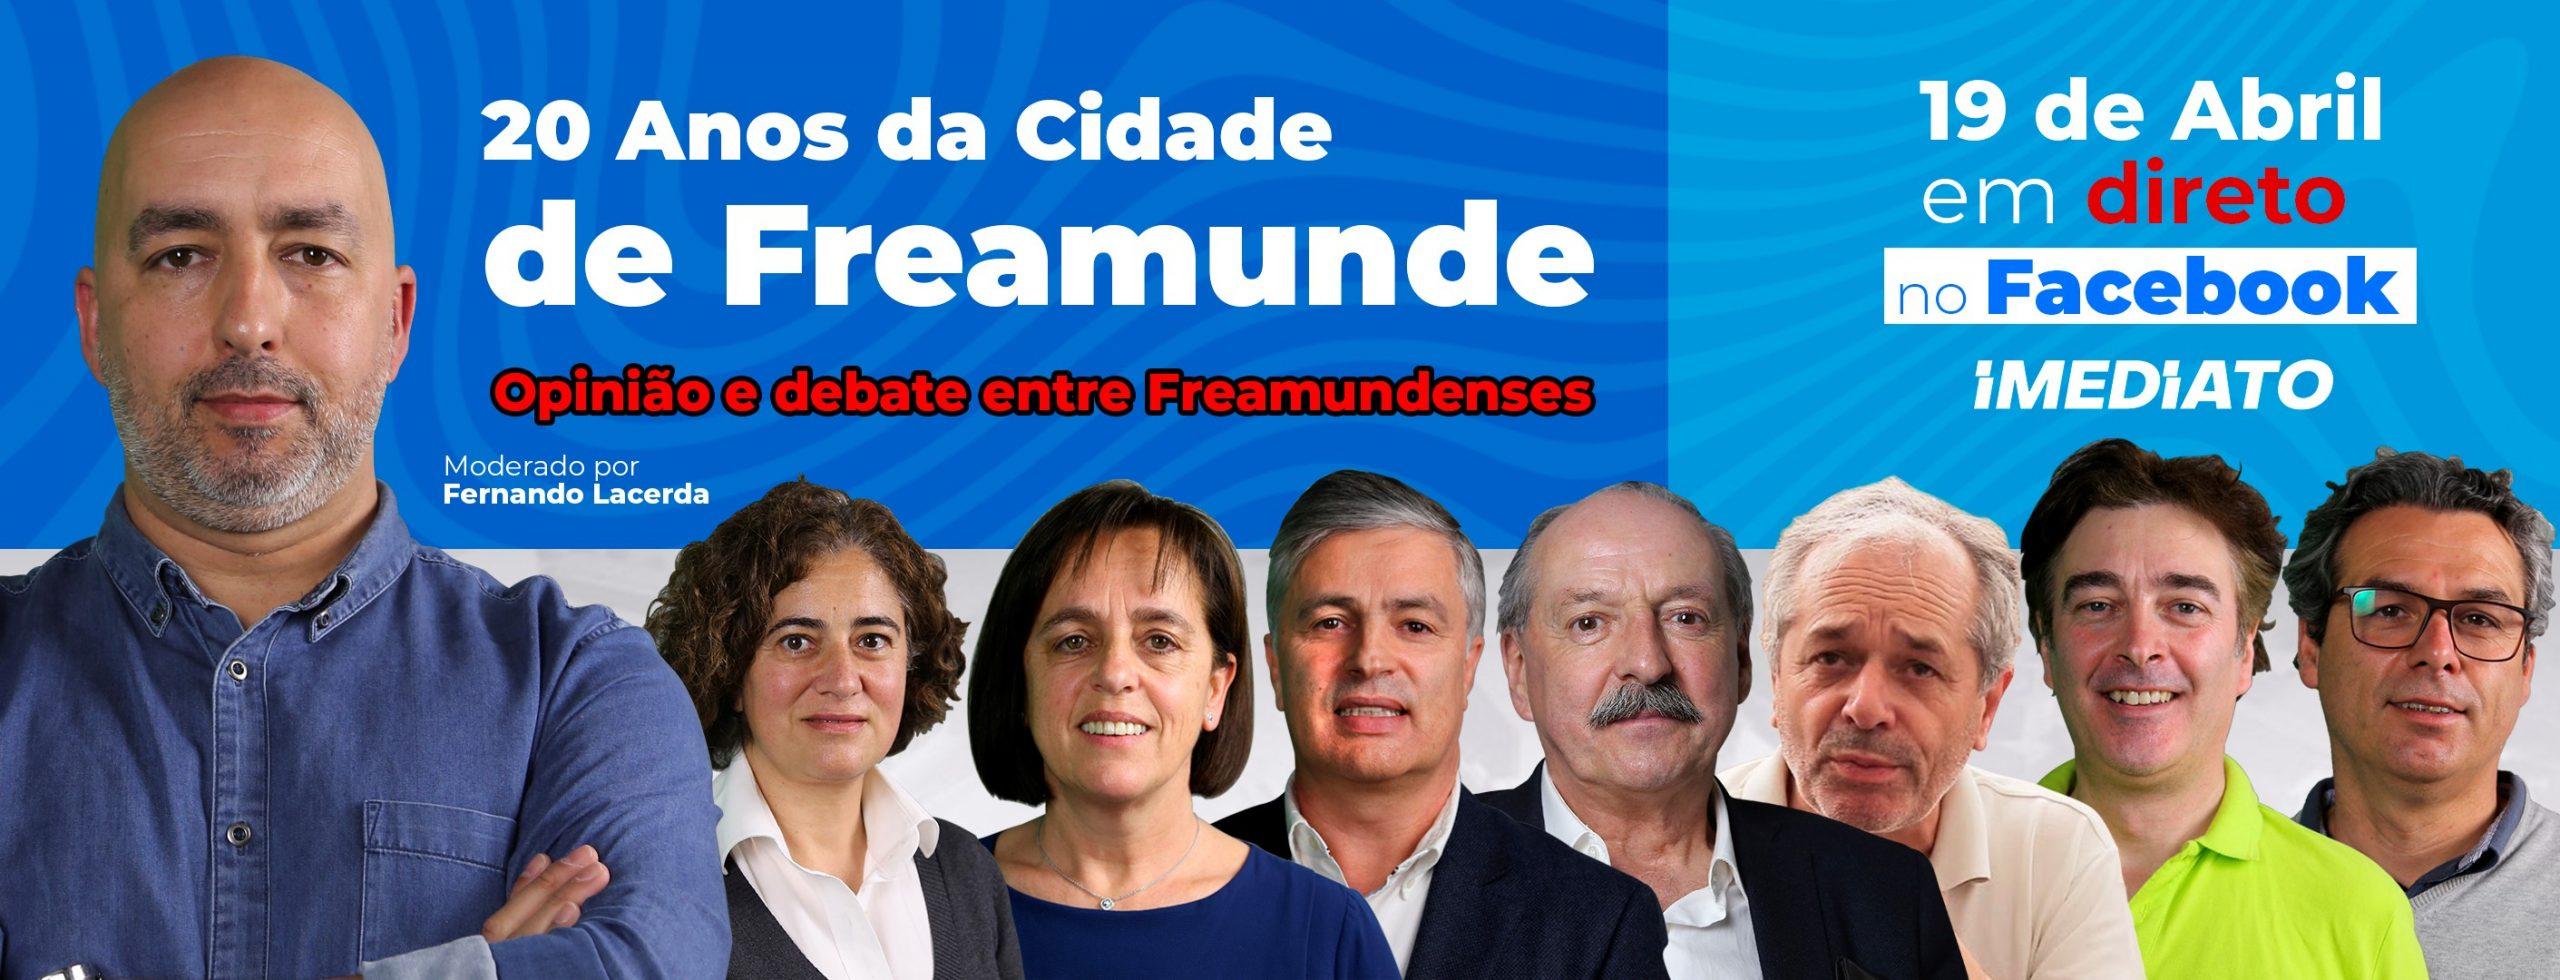 cartaz debate freamunde scaled